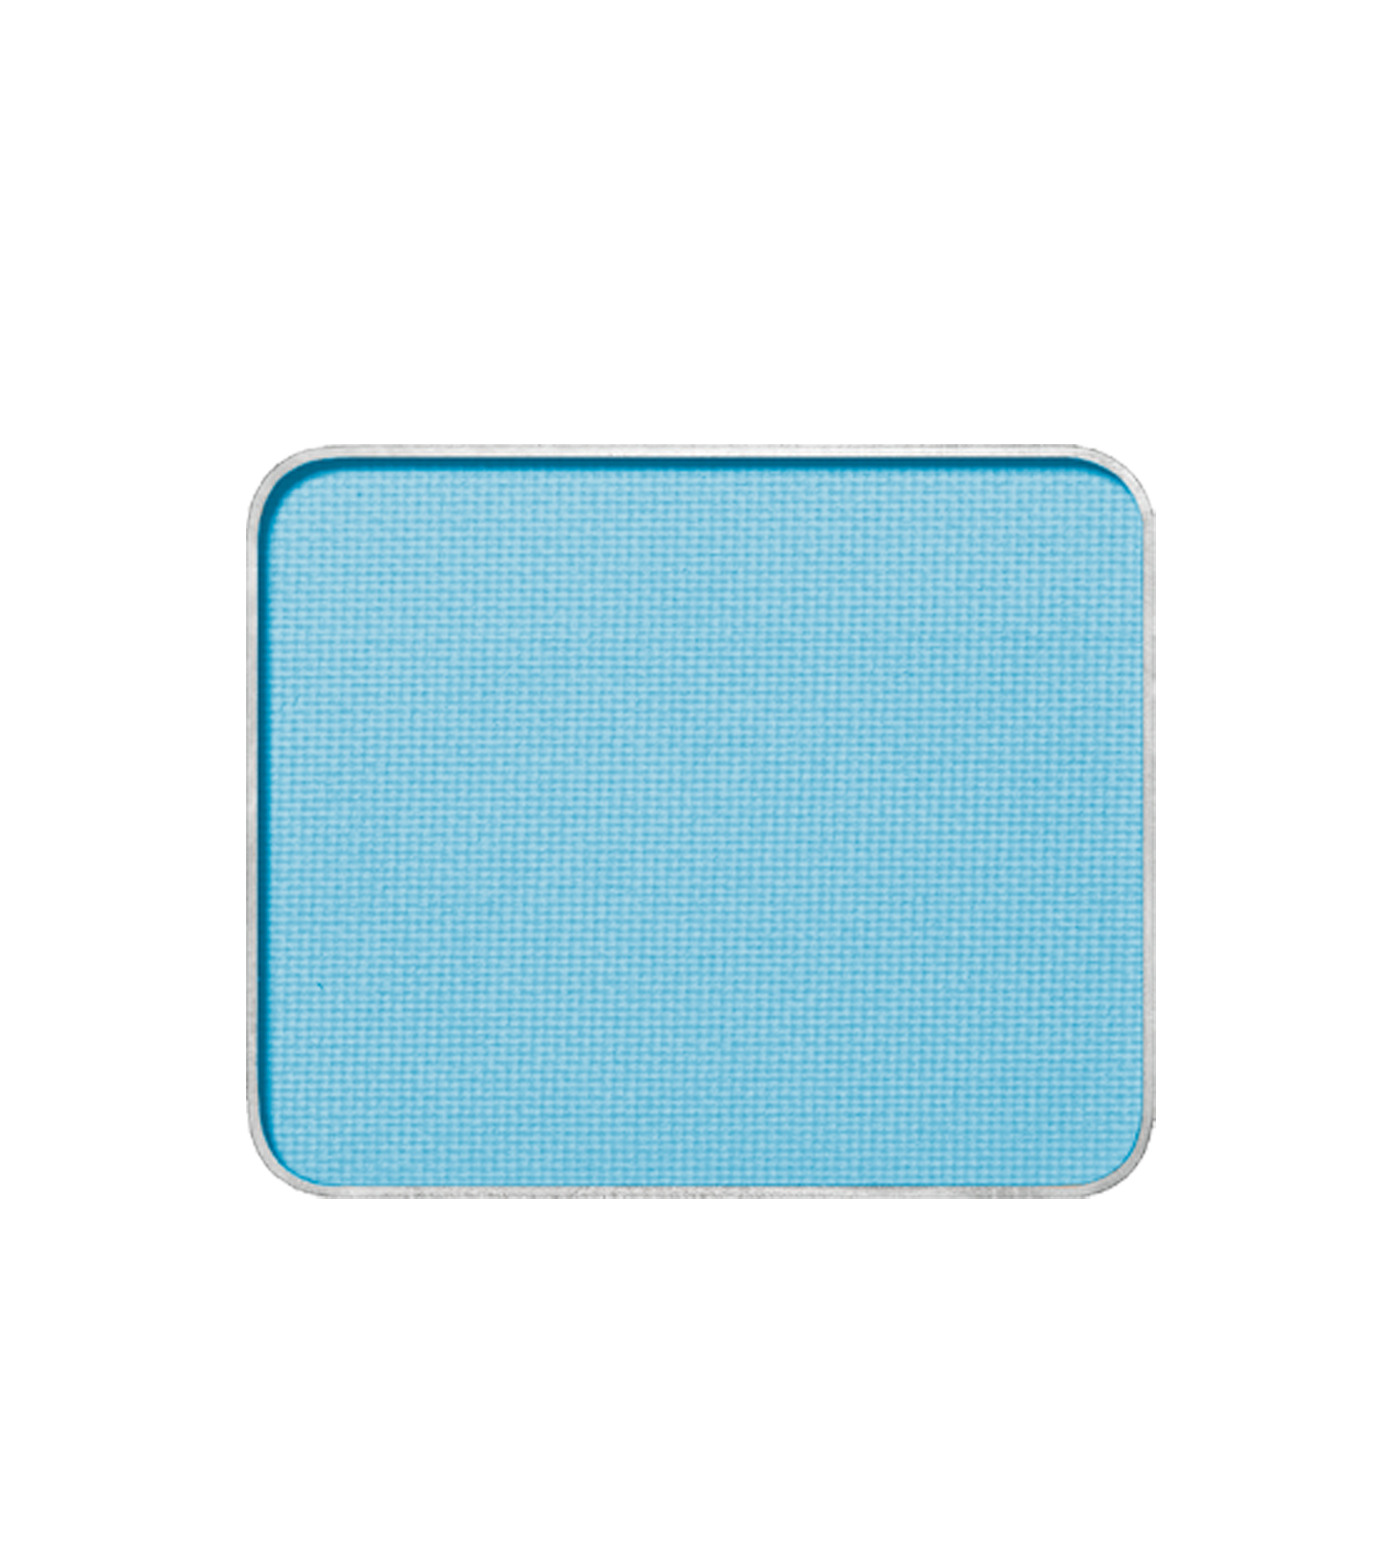 Yazbukey for shu uemura(ヤズブキー for シュウ ウエムラ)のDuo Eye Shadow -Blue--BLUE(MAKE-UP/MAKE-UP)-F5621500-900-92 拡大詳細画像2